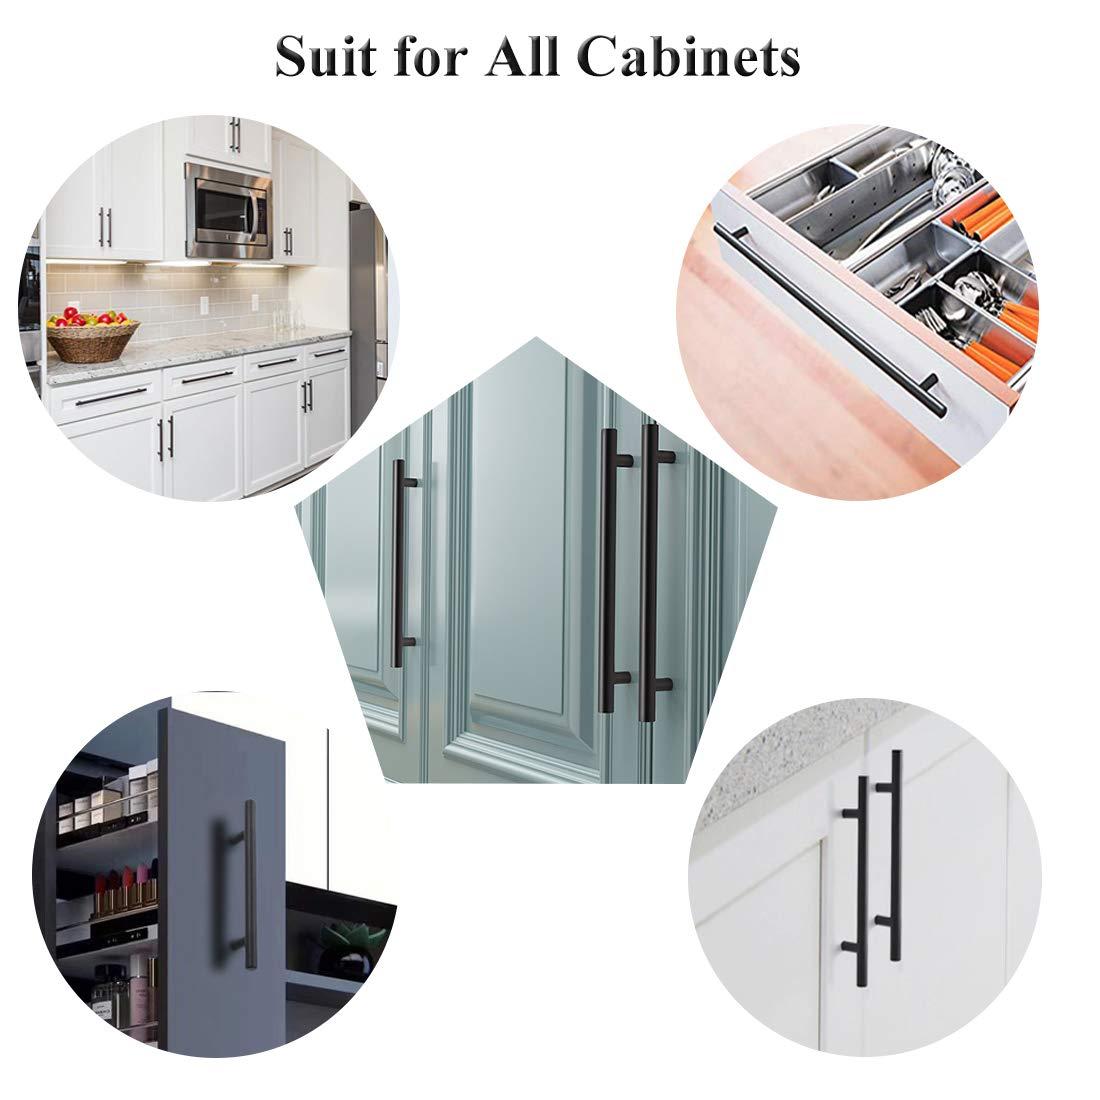 Probrico Flat Black Modern Cabinet Hardware Cupboard Pull Kitchen Cabinet T Bar Handle Dresser Knobs Set 4 Hole Spacing 25 Pack